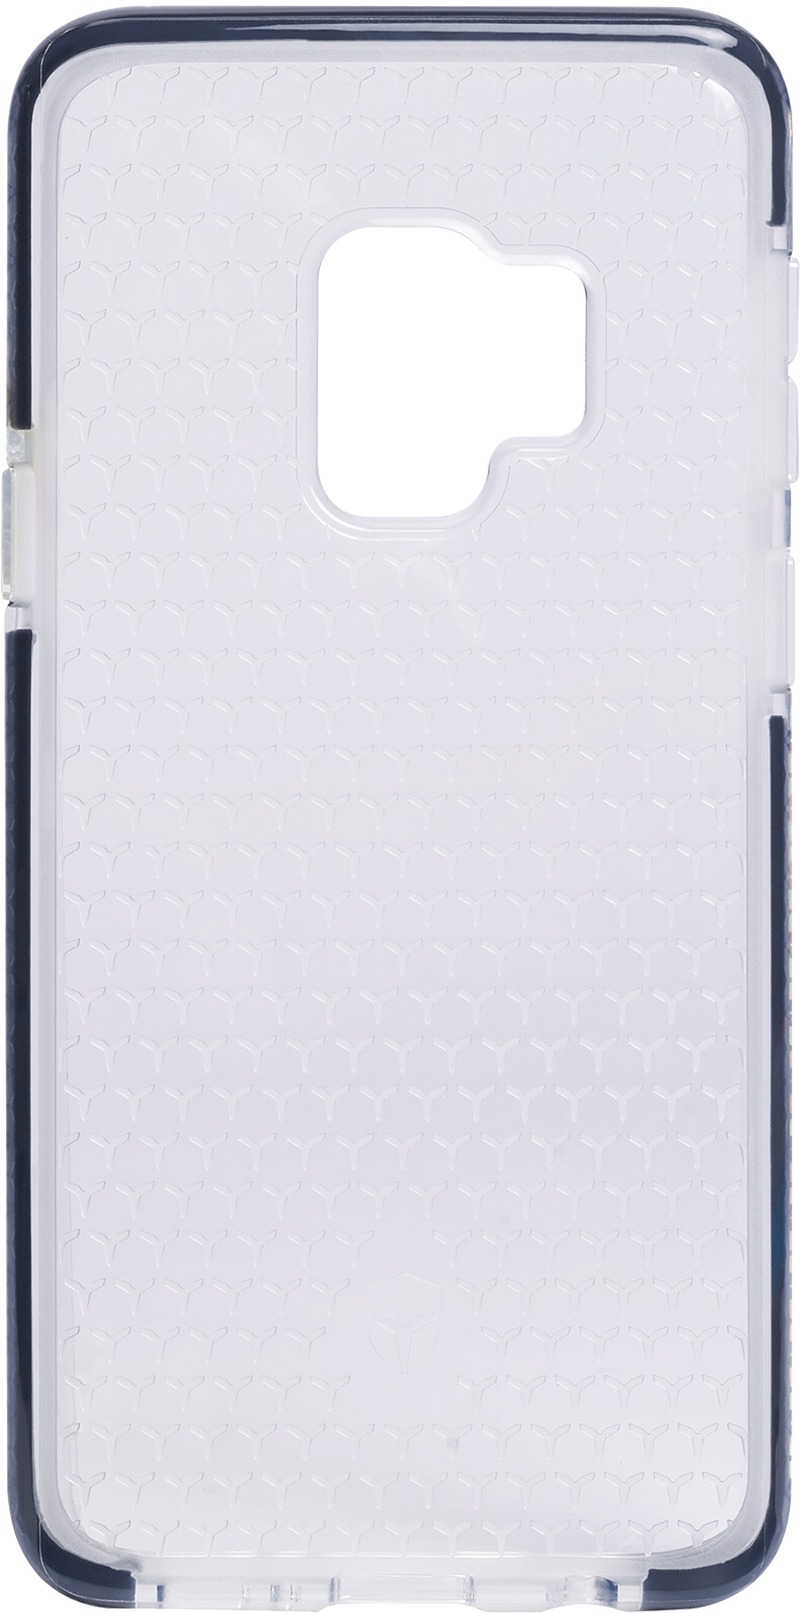 Coque Force Case life Galaxy S9 transparente